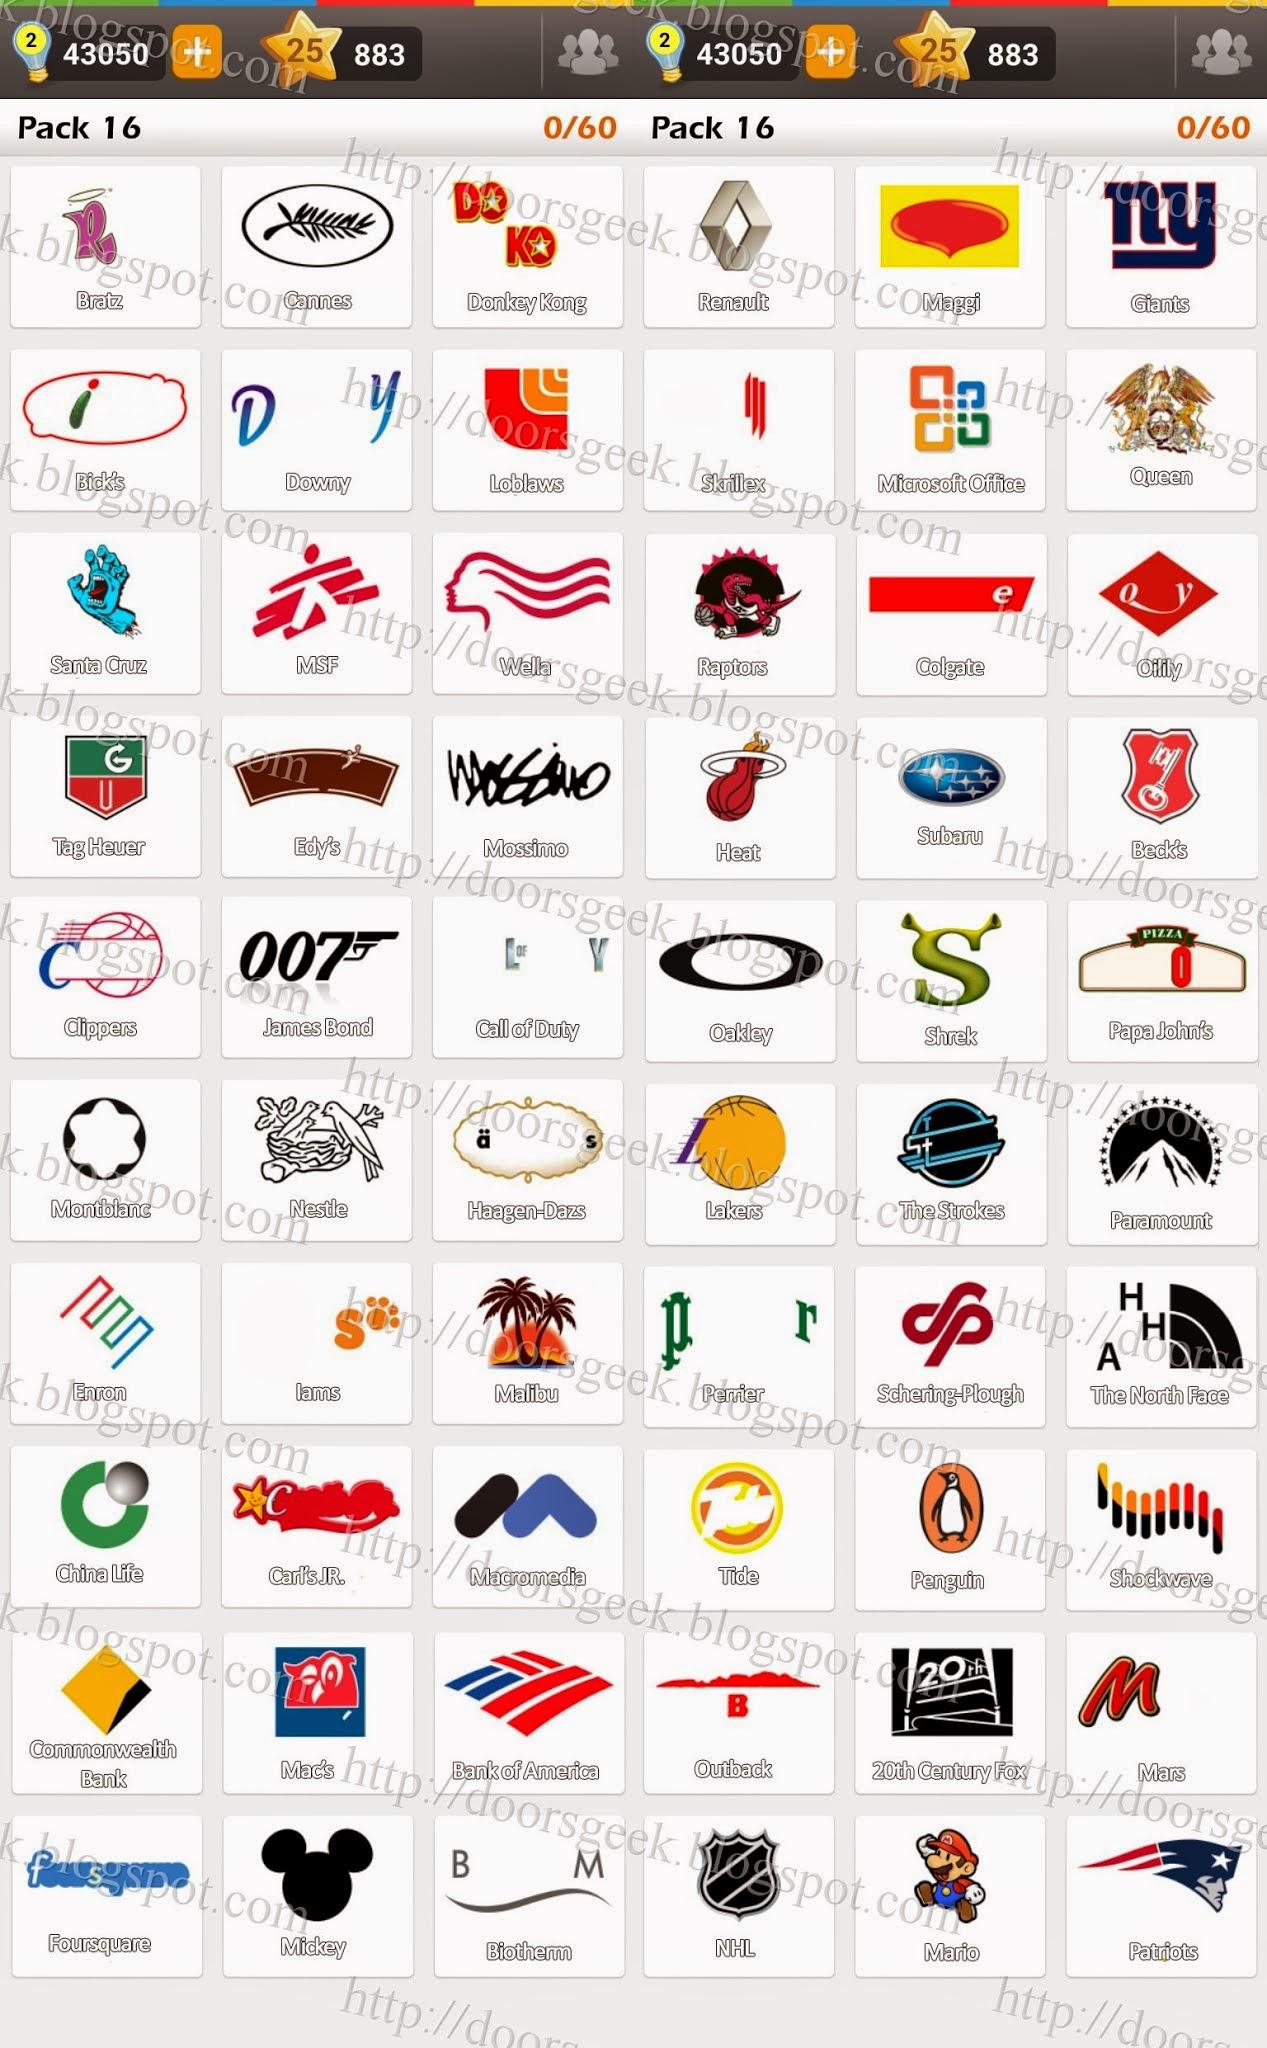 Souvent Logo Game: Guess the Brand [Regular] Pack 16 ~ Doors Geek IA33